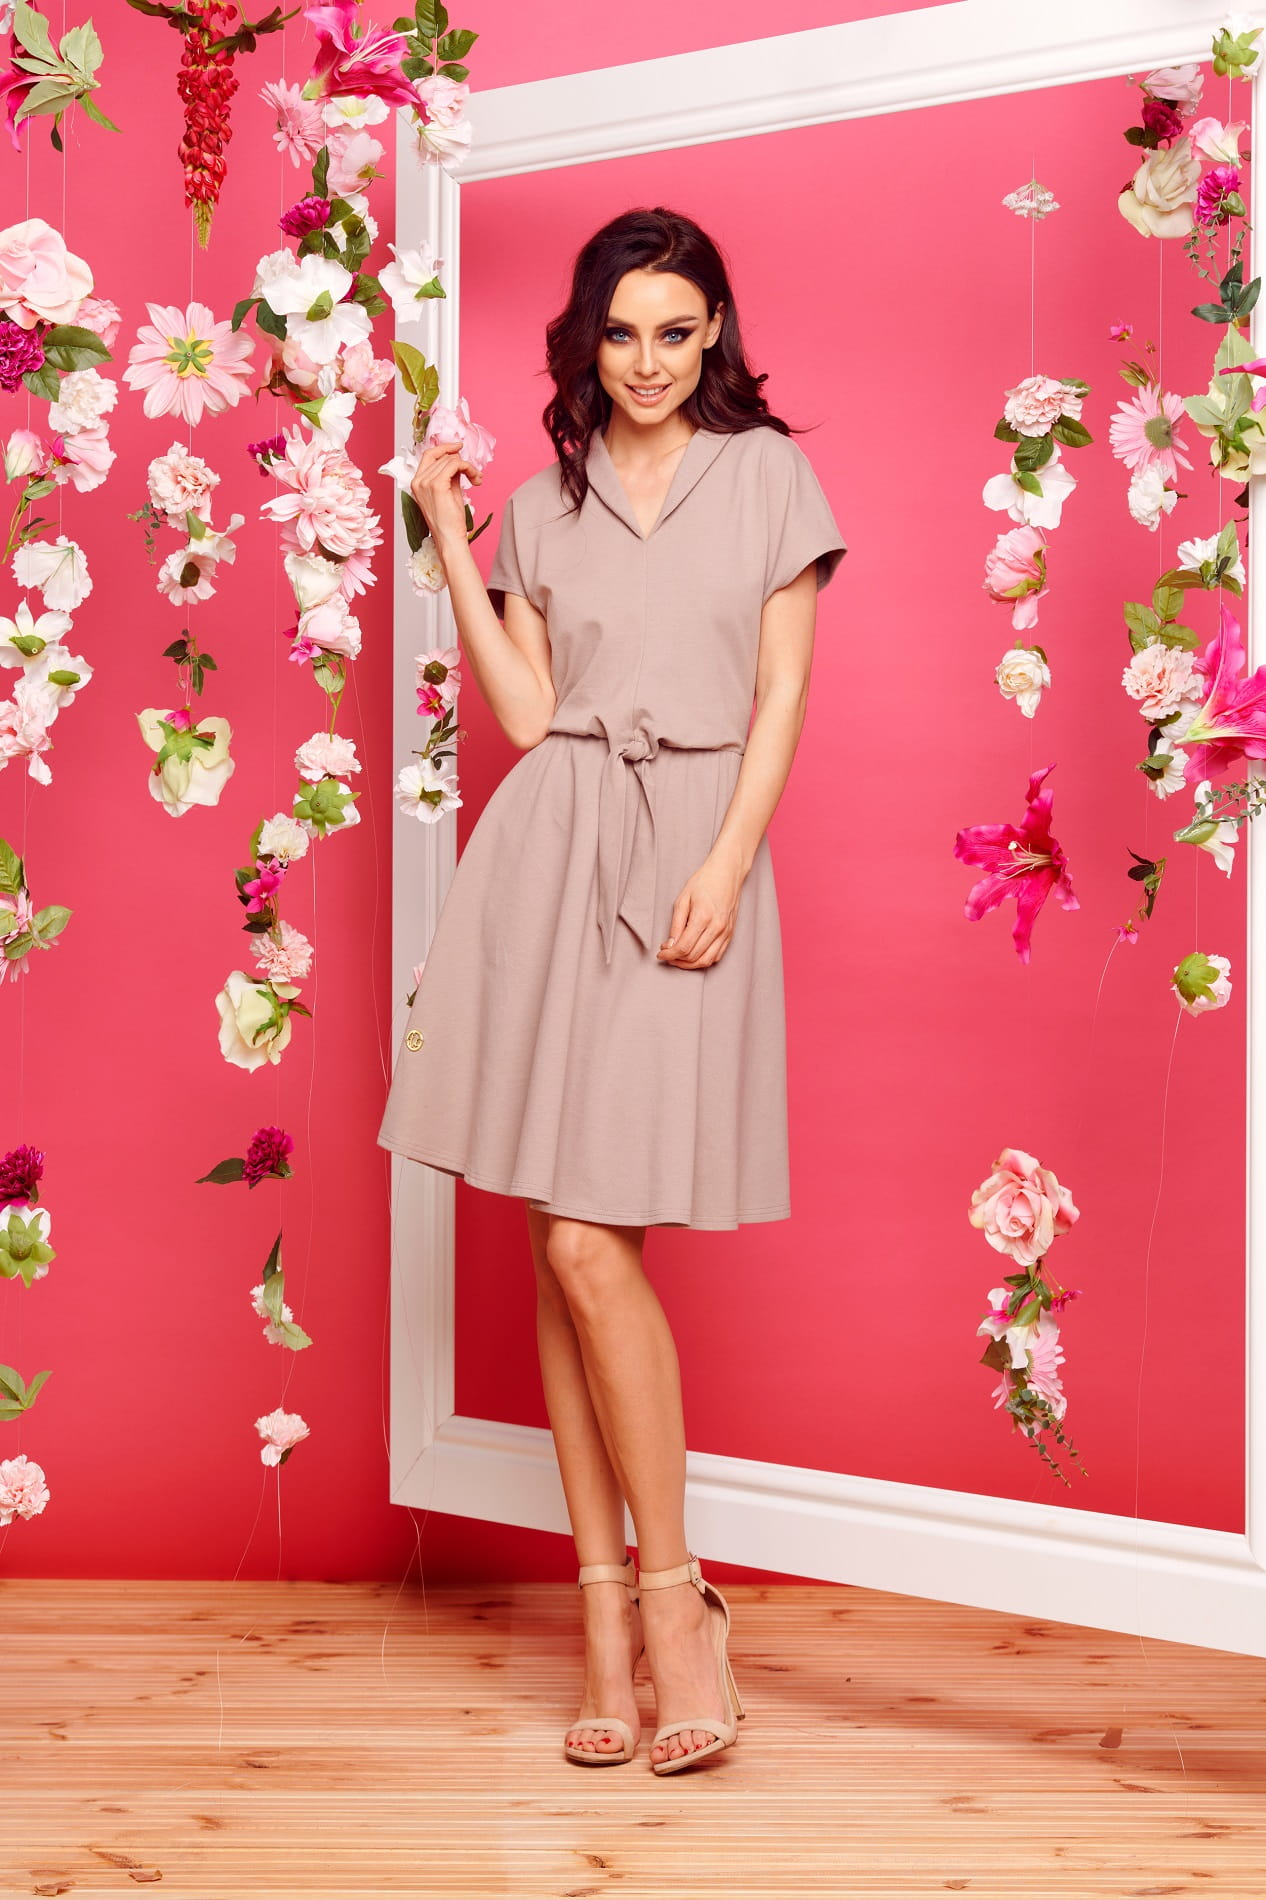 bf98e5428b Sukienka dresowa elegancka capucino Lemoniade BERKA odzież damska i ...